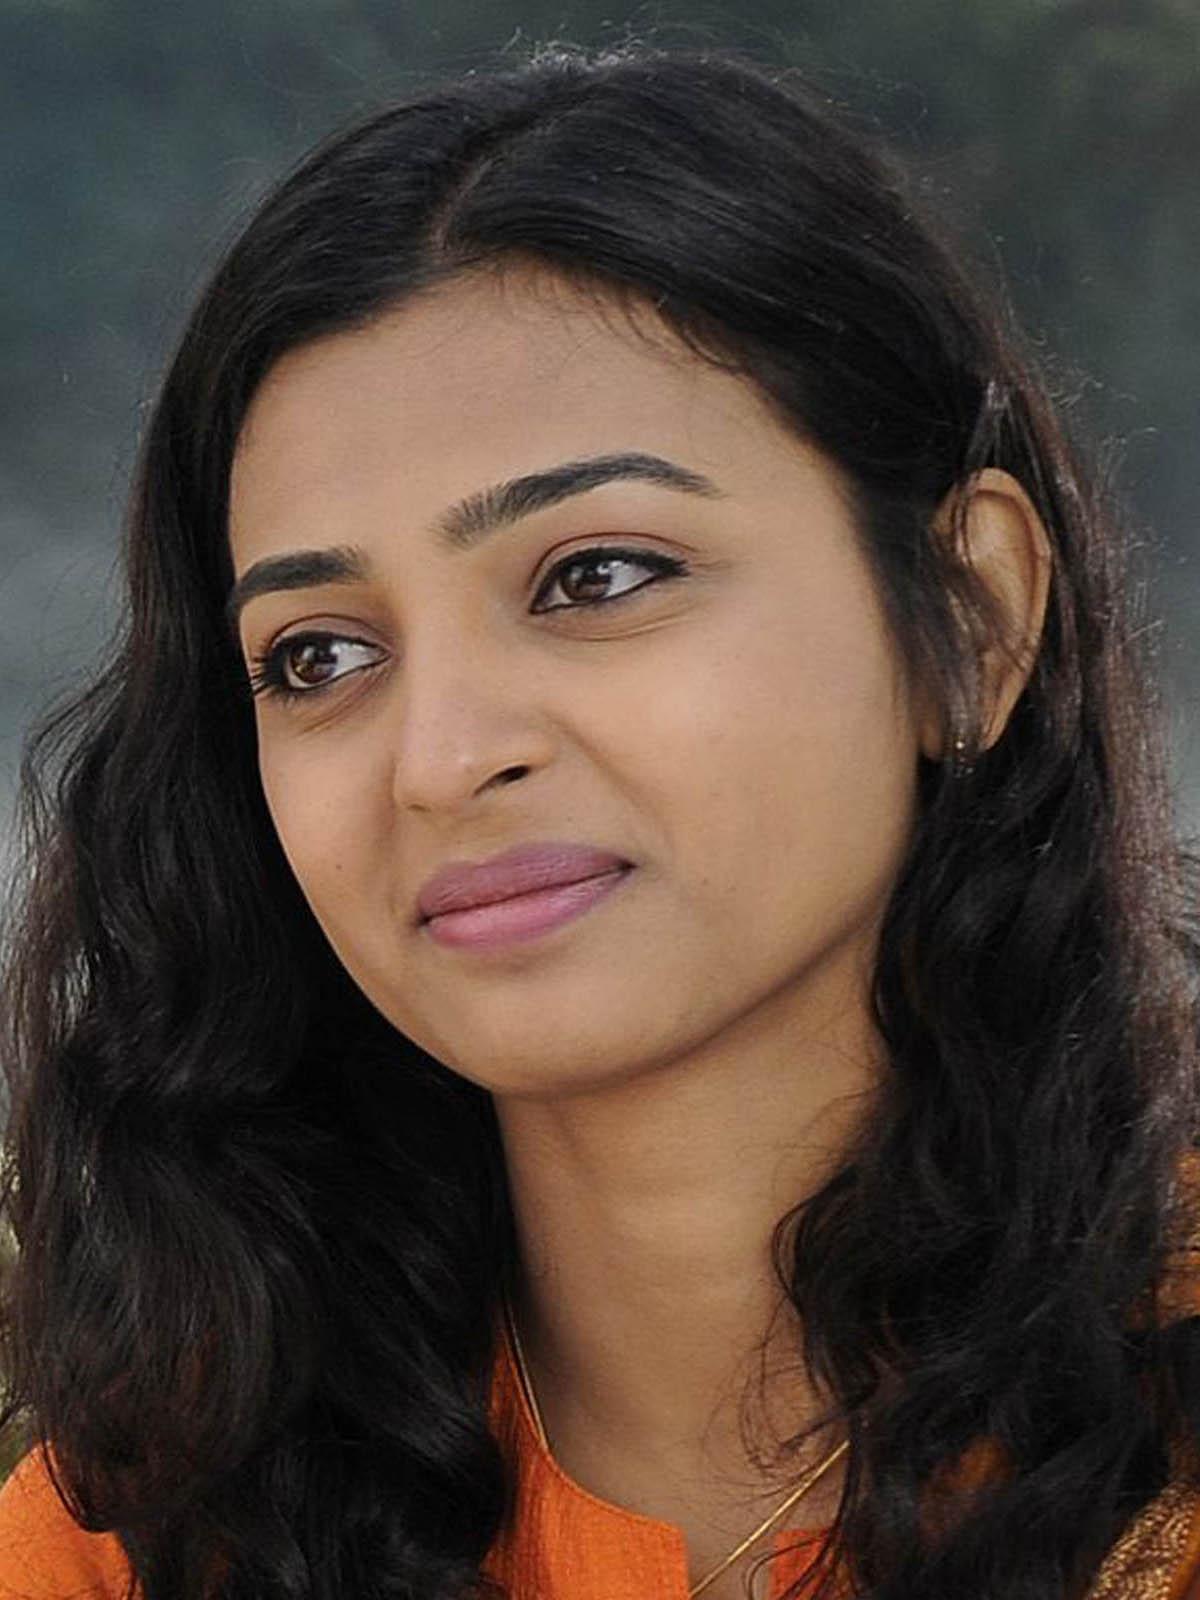 Amit Name Wallpaper Hd Radhika Apte All Movie List Hdwallpaper